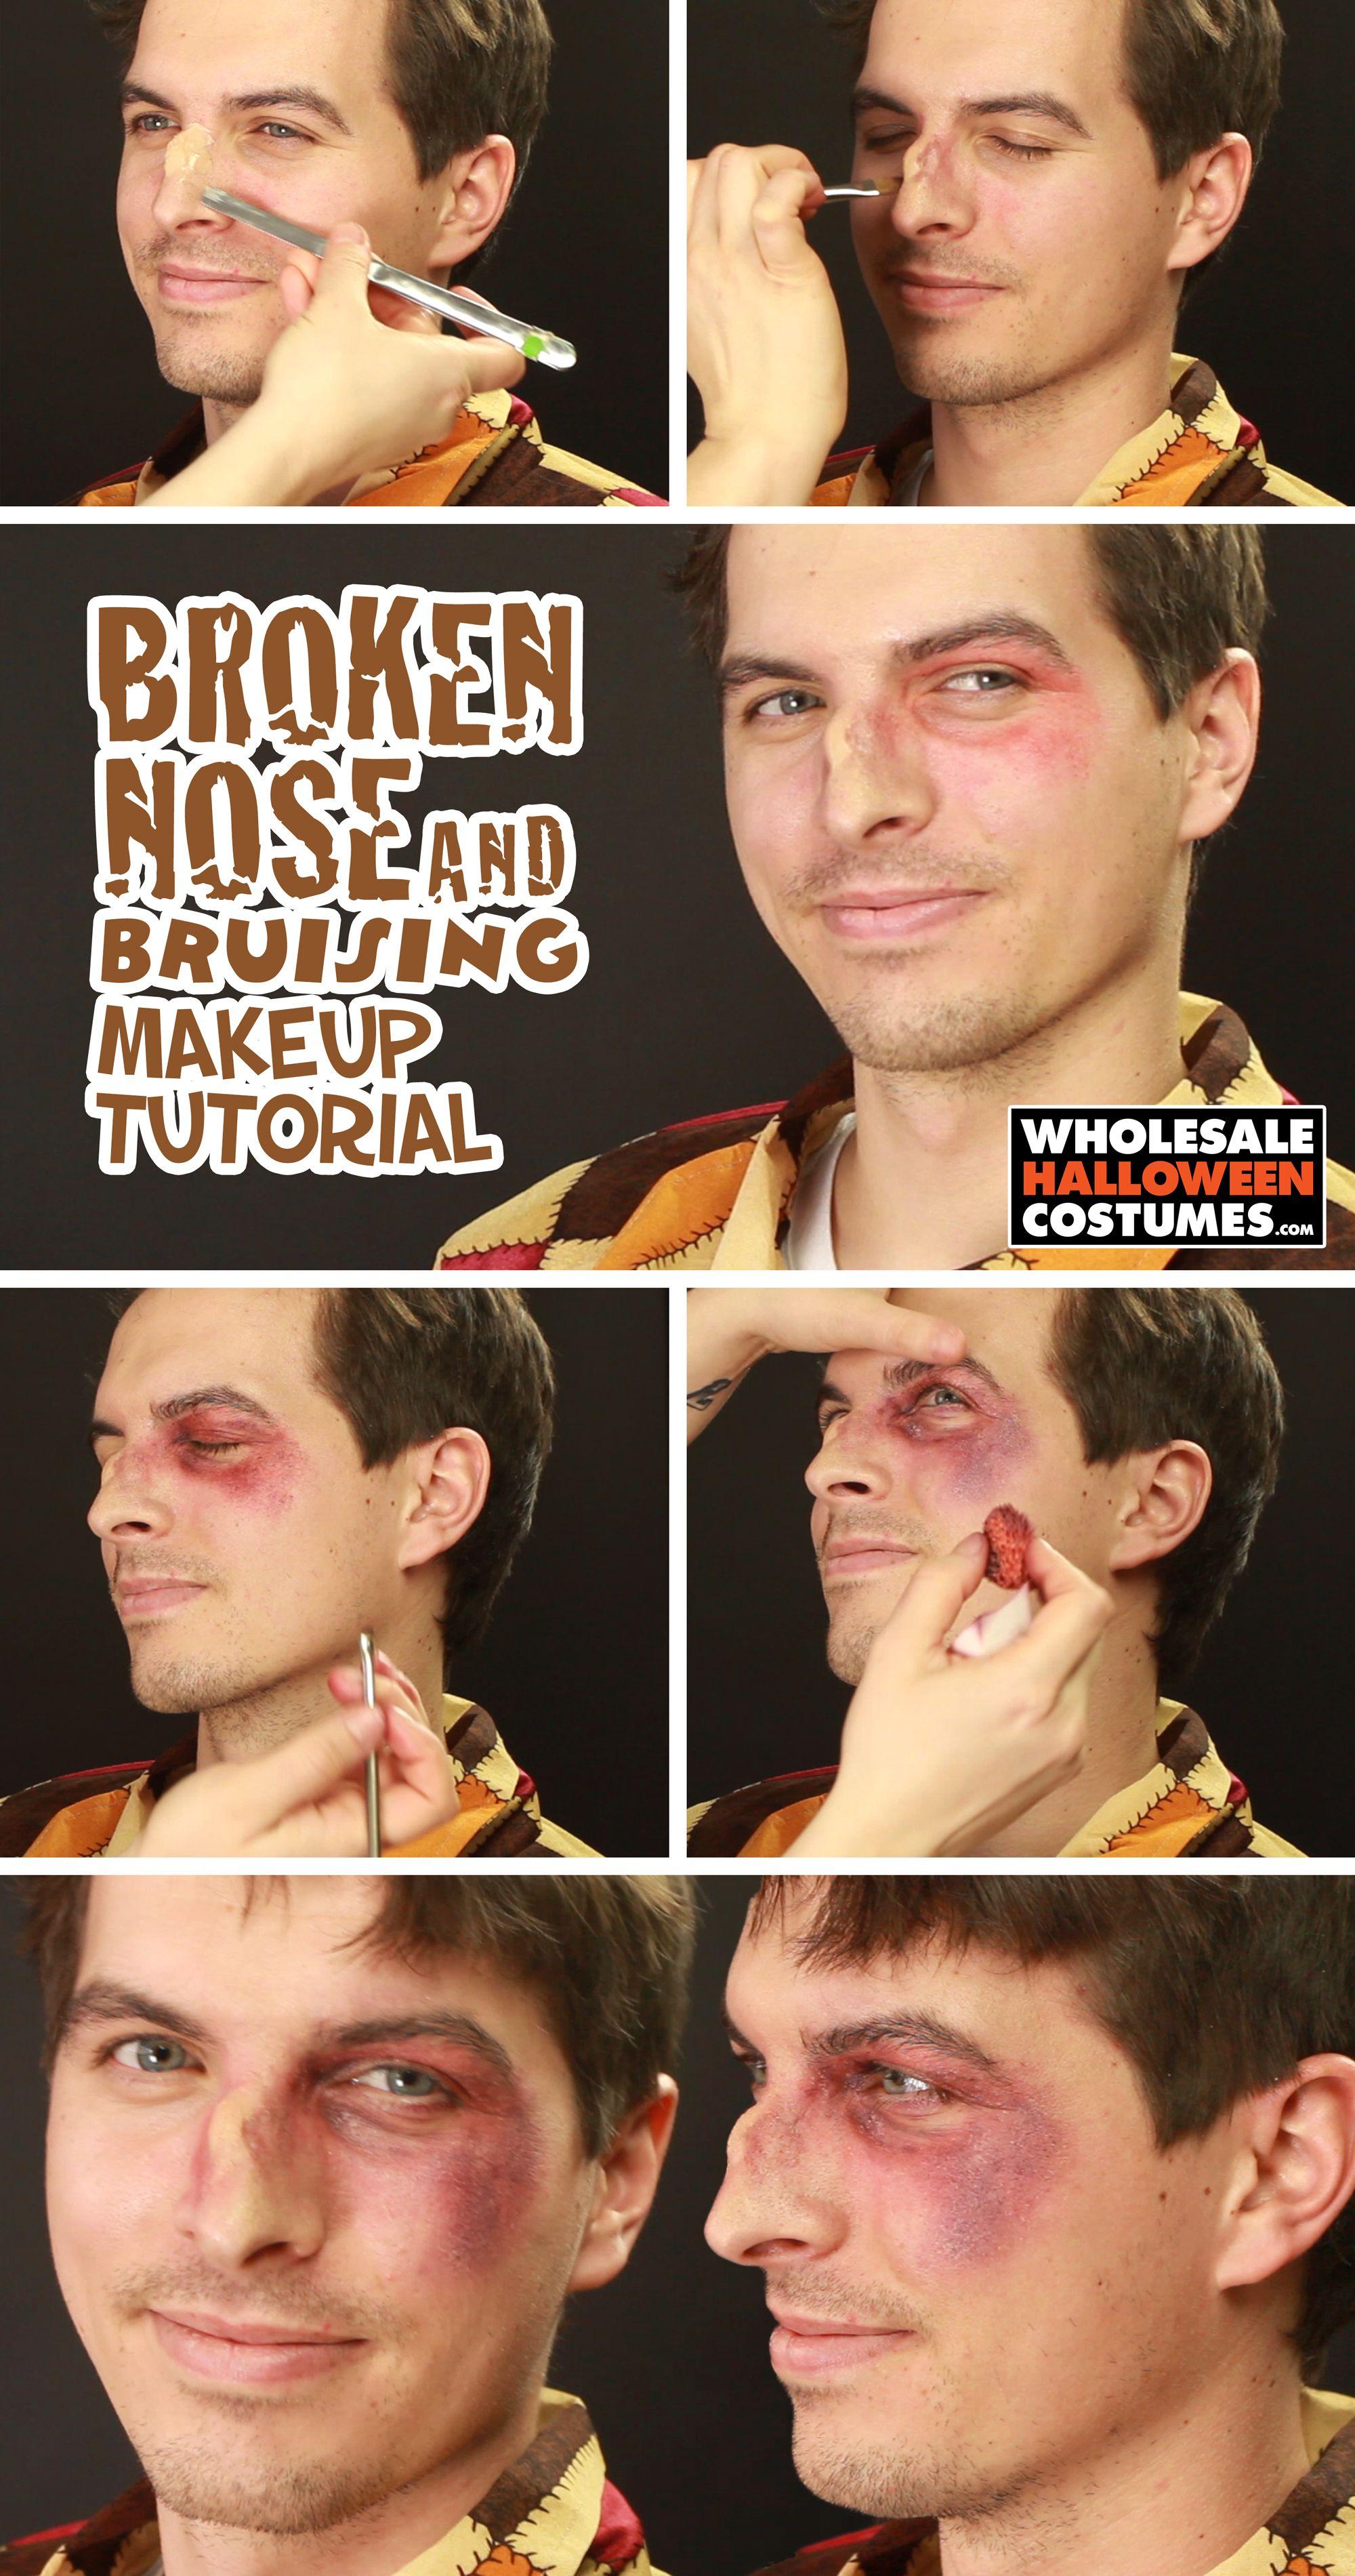 Broken nose and bruising makeup tutorial wholesale halloween broken nose bruising makeup tutorial wholesale halloween costumes blog baditri Choice Image